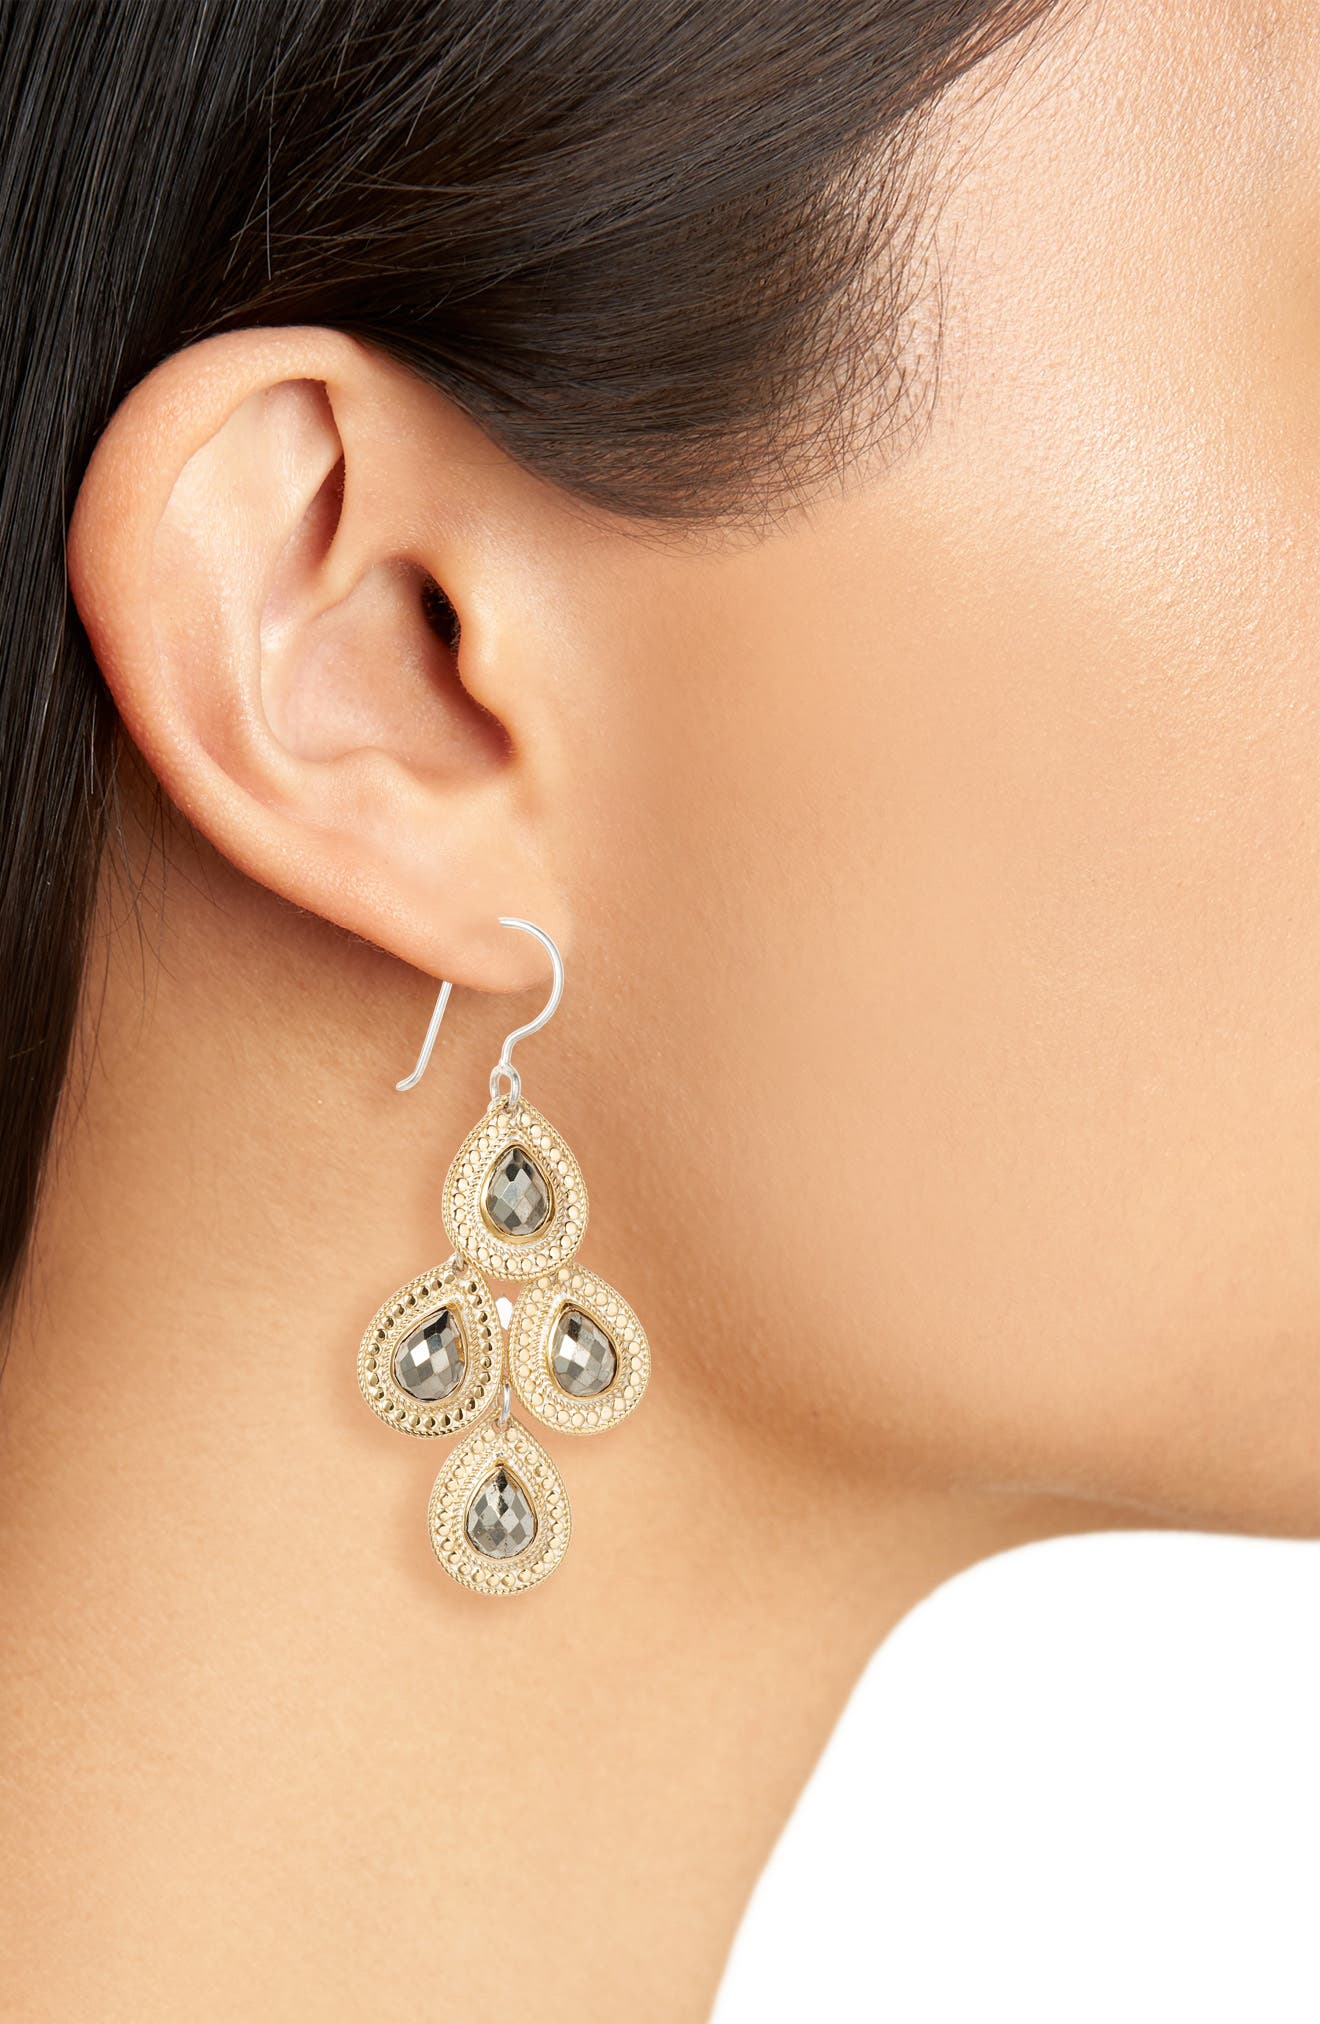 Stone Chandelier Earrings,                             Alternate thumbnail 2, color,                             Gold/ Silver/ Pyrite